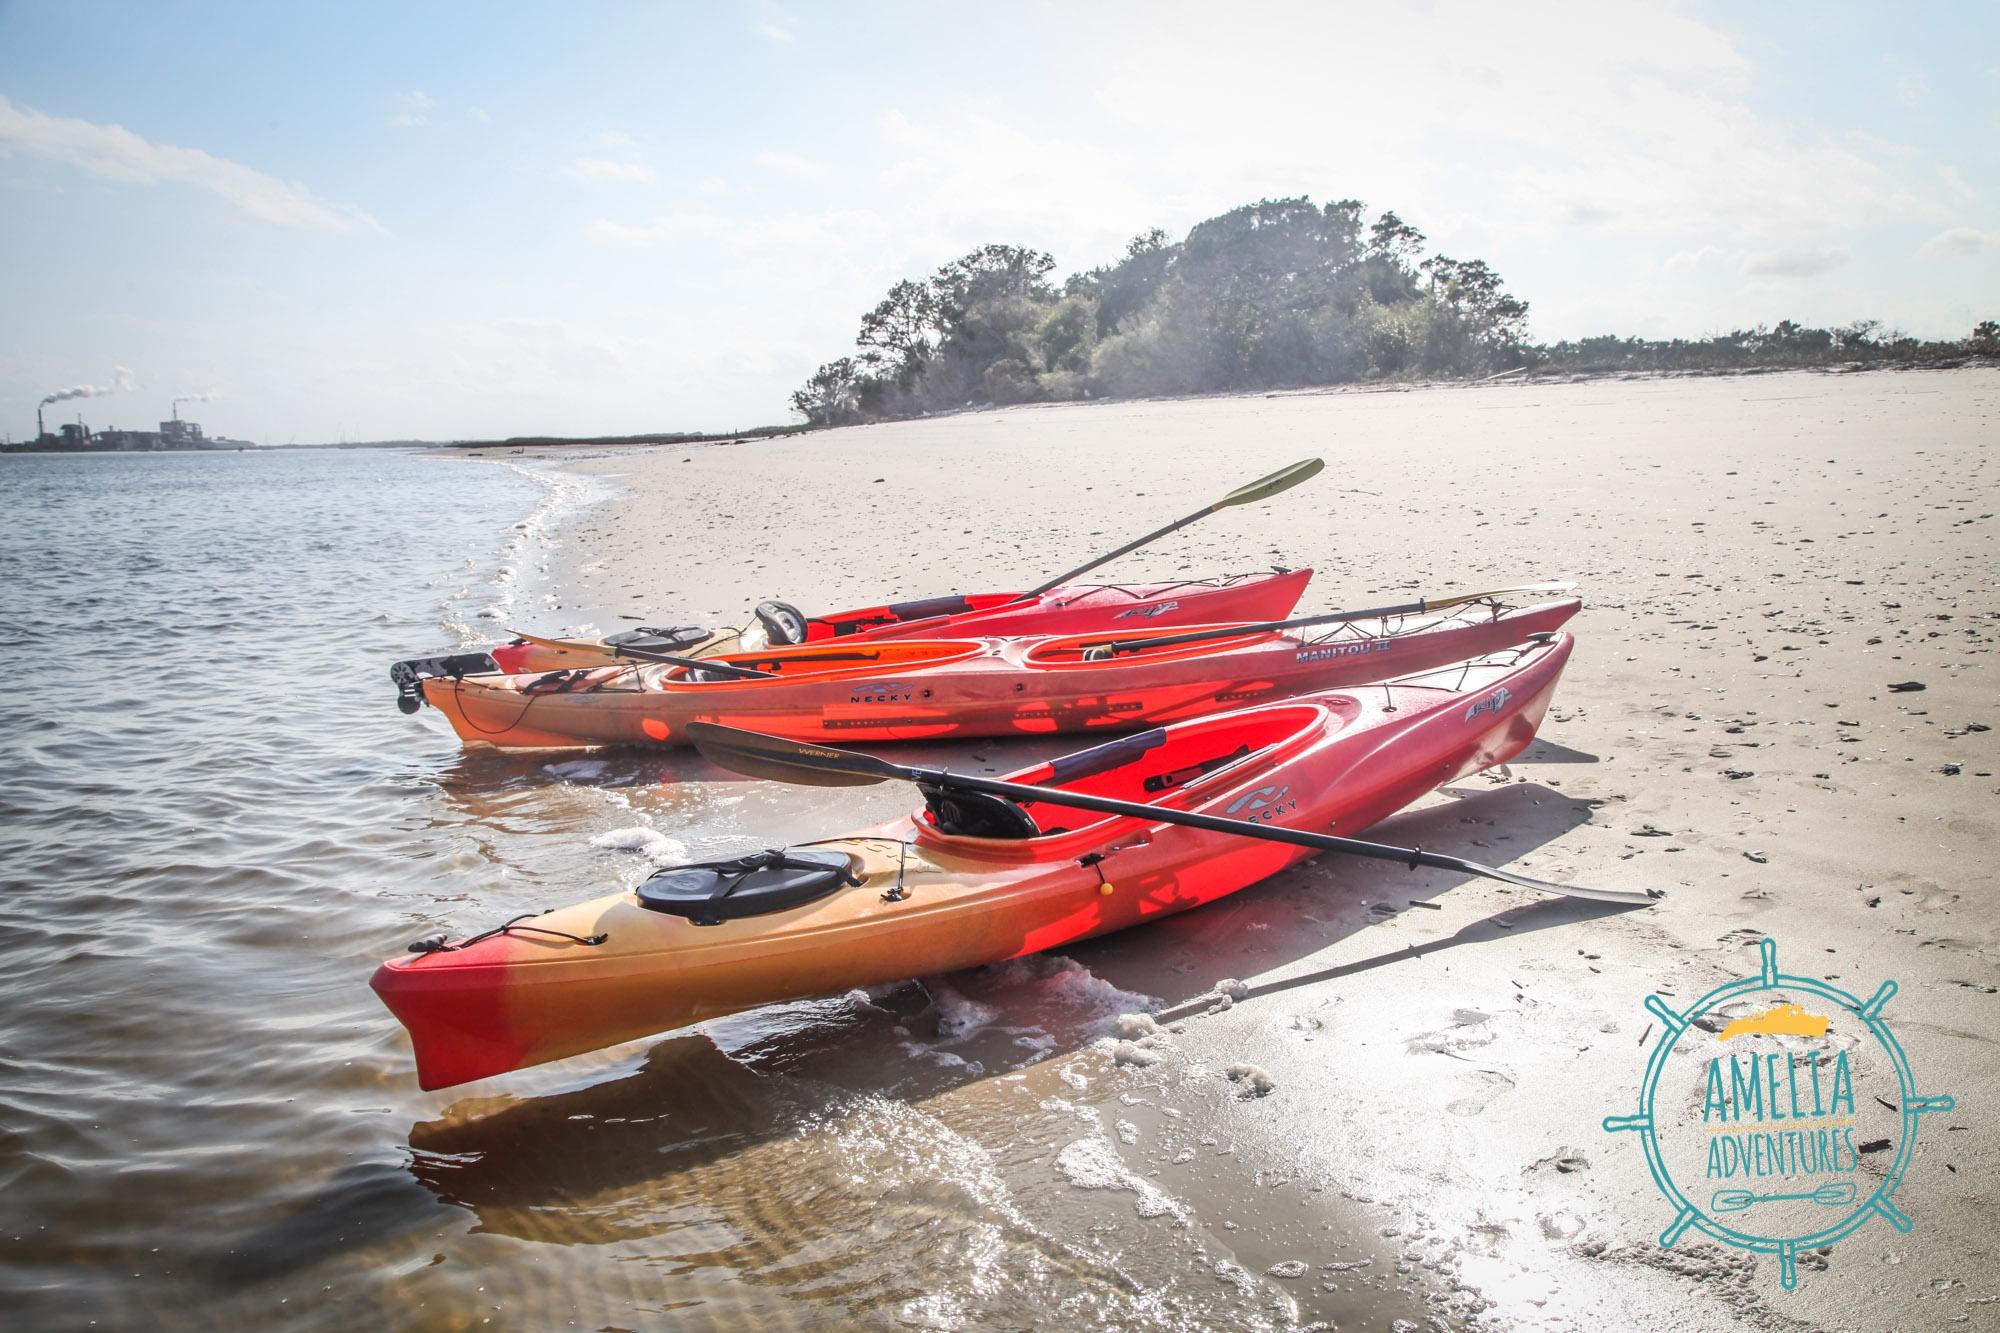 Sea kayaking with Amelia Aventures in Fernandina Beach, Florida.